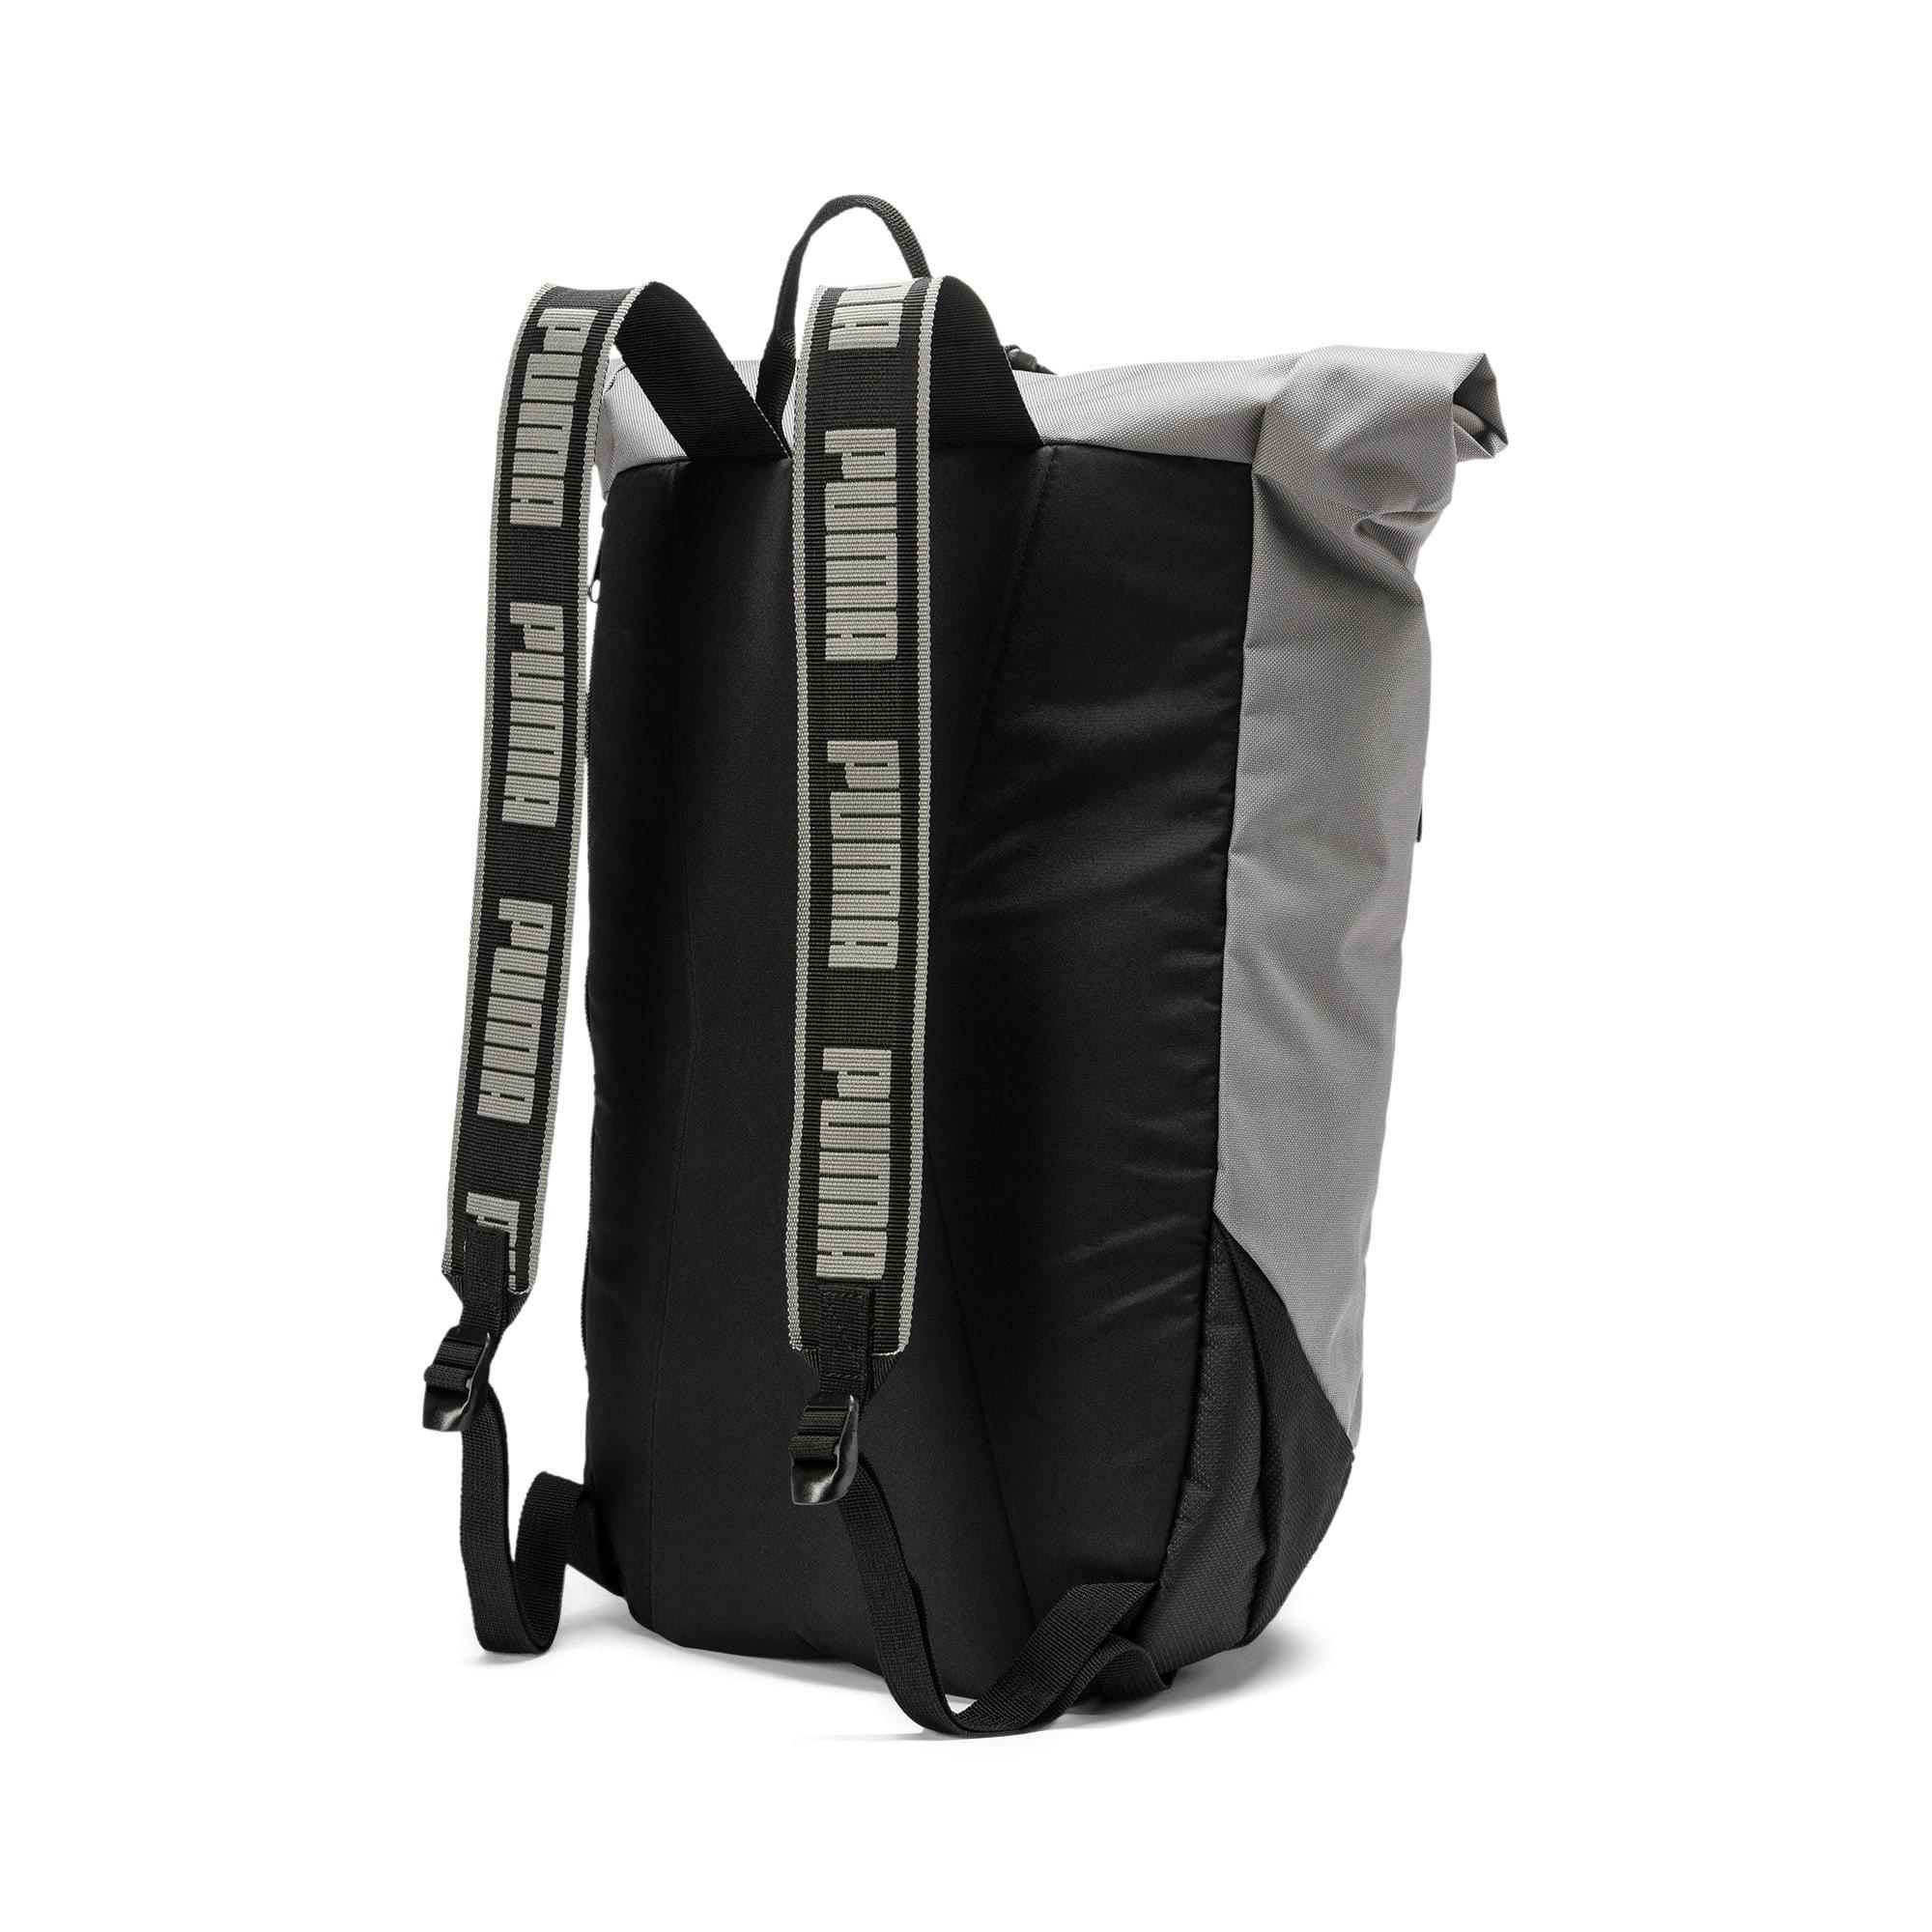 Thumbnail 2 of Sole Backpack, CASTLEROCK, medium-IND